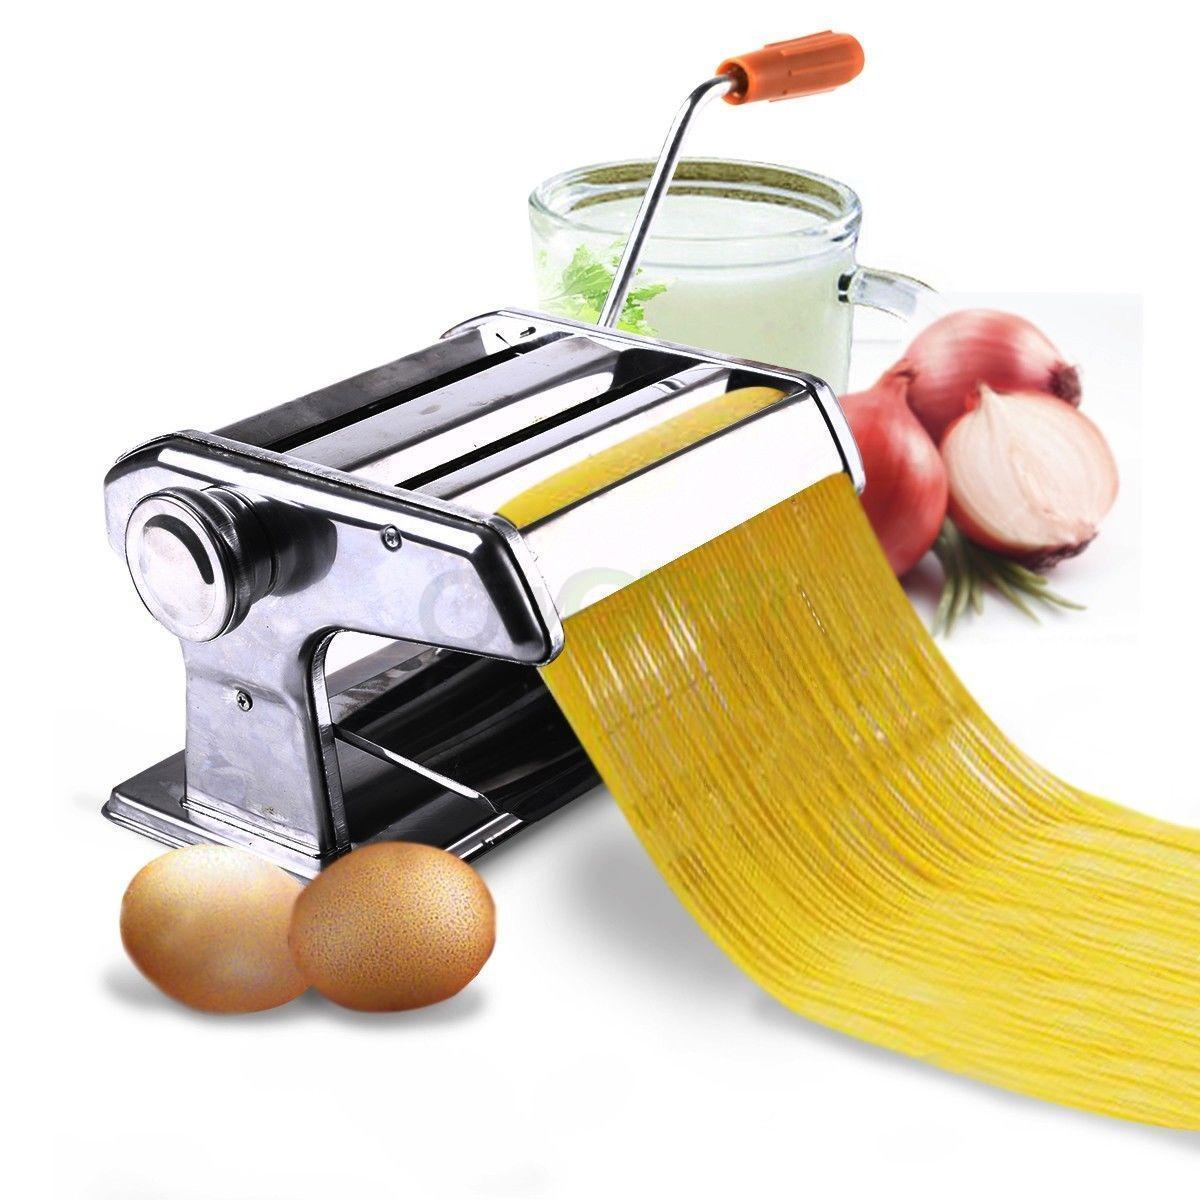 "Ktaxon 6"" Pasta Maker & Roller Machine Noodle Spaghetti & Fettuccine Maker Noodle Making Machine - image 8 of 8"